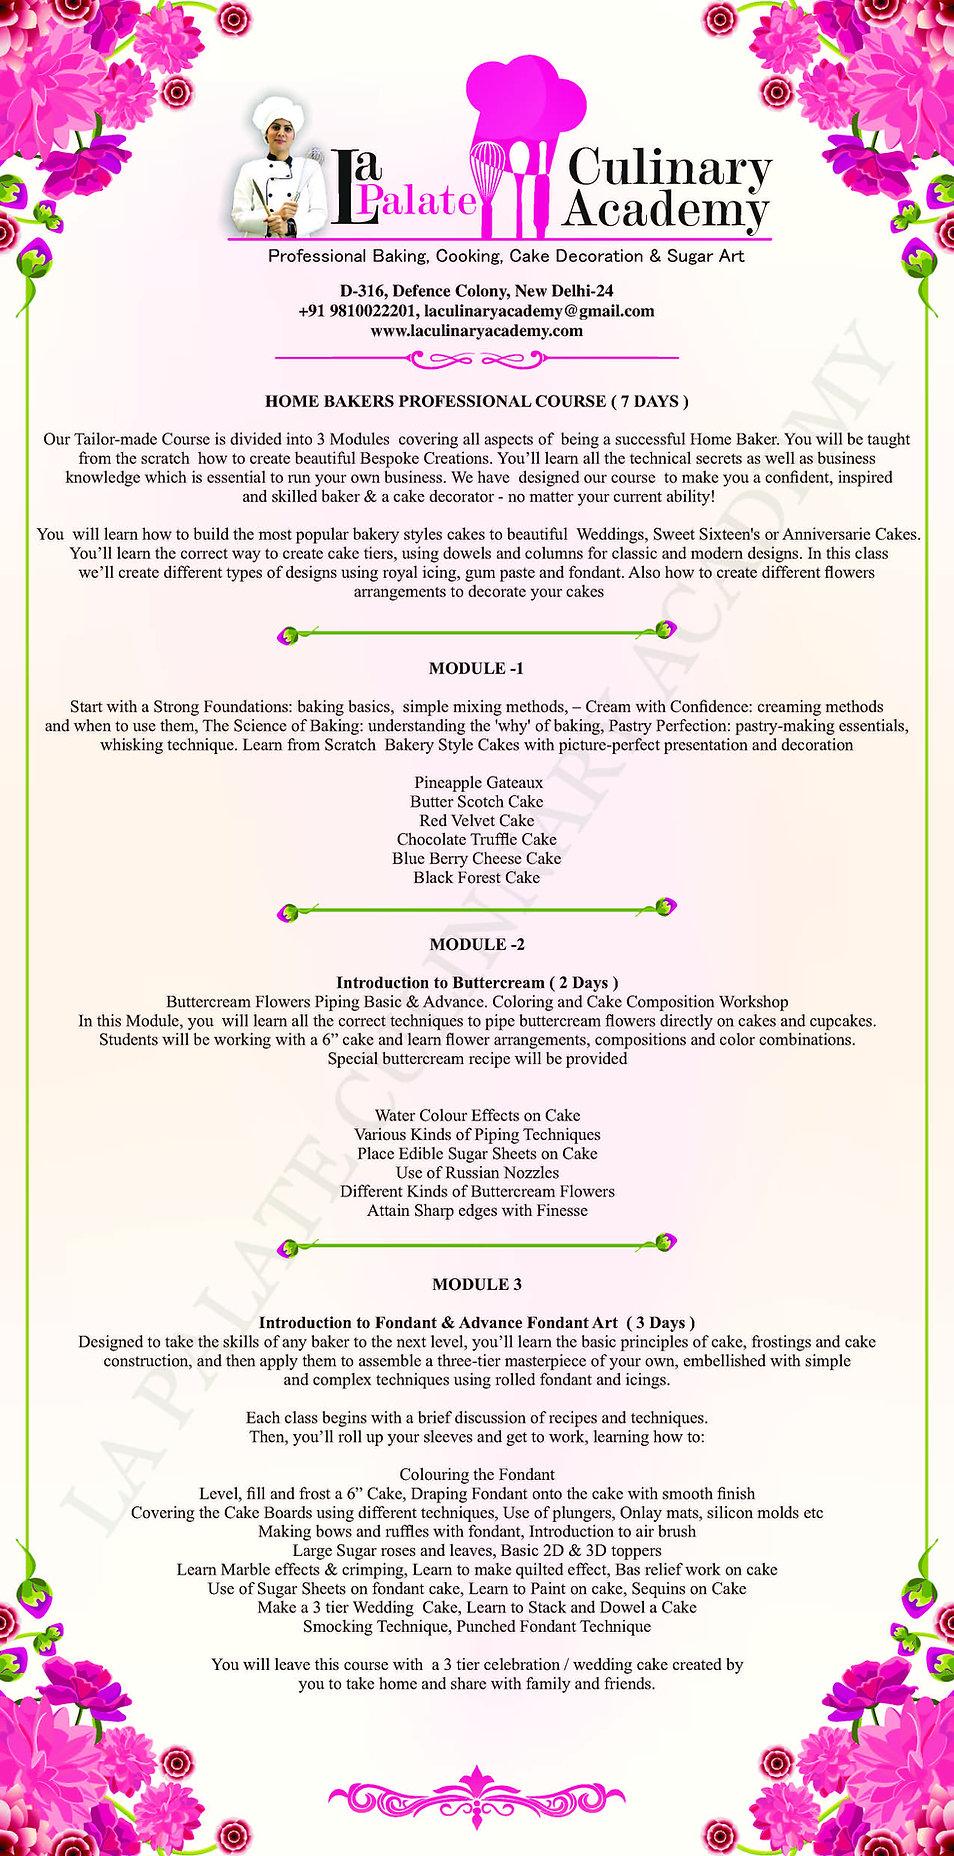 Learn Cake Decoration ,Sugar Craft , Edible Figurine , Fondant Craft  in Delhi - La Palate Culinary Academy. New Delhi